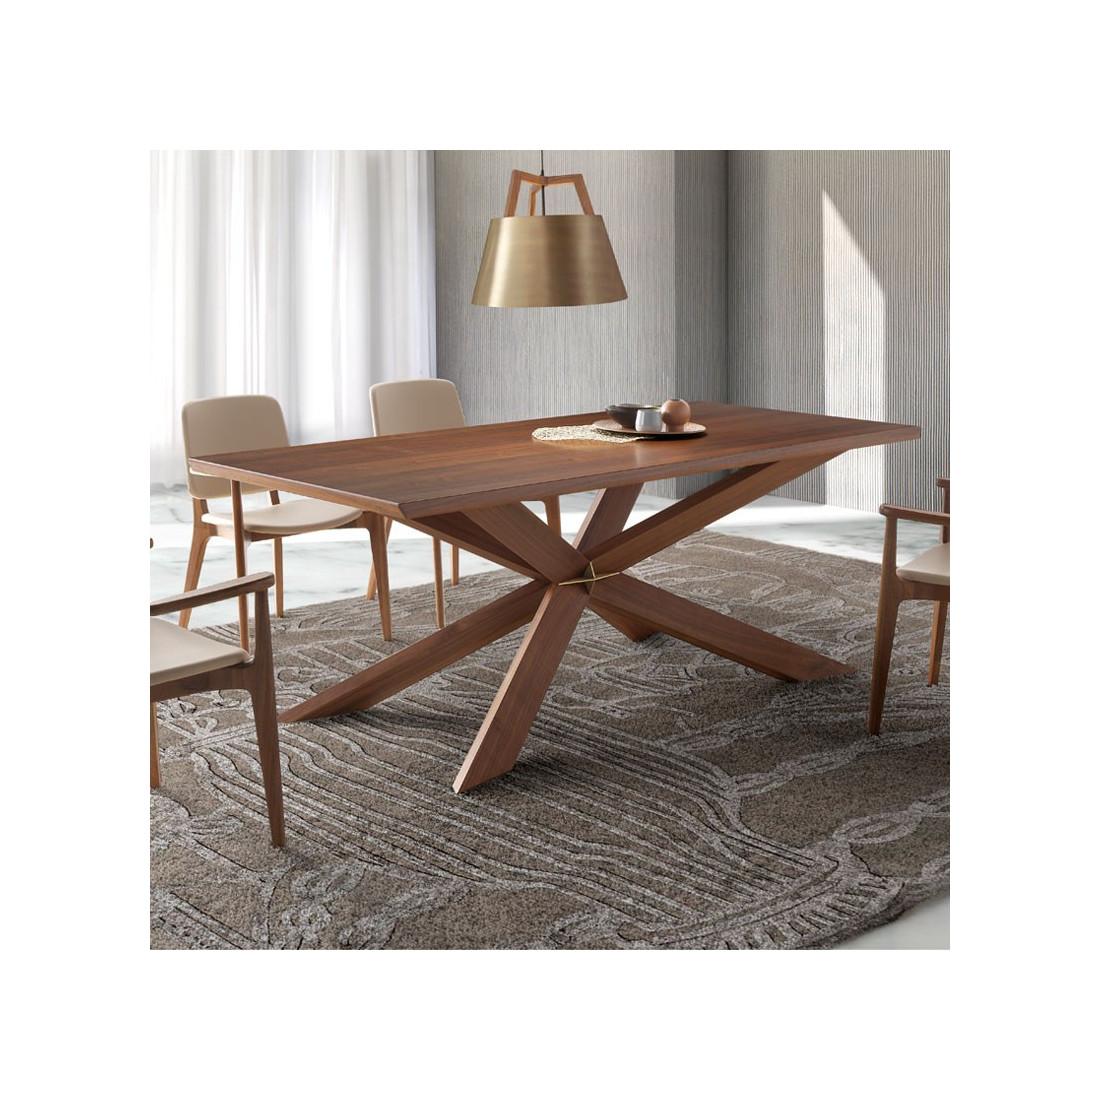 table de repas bois noyer walnut univers salle manger. Black Bedroom Furniture Sets. Home Design Ideas